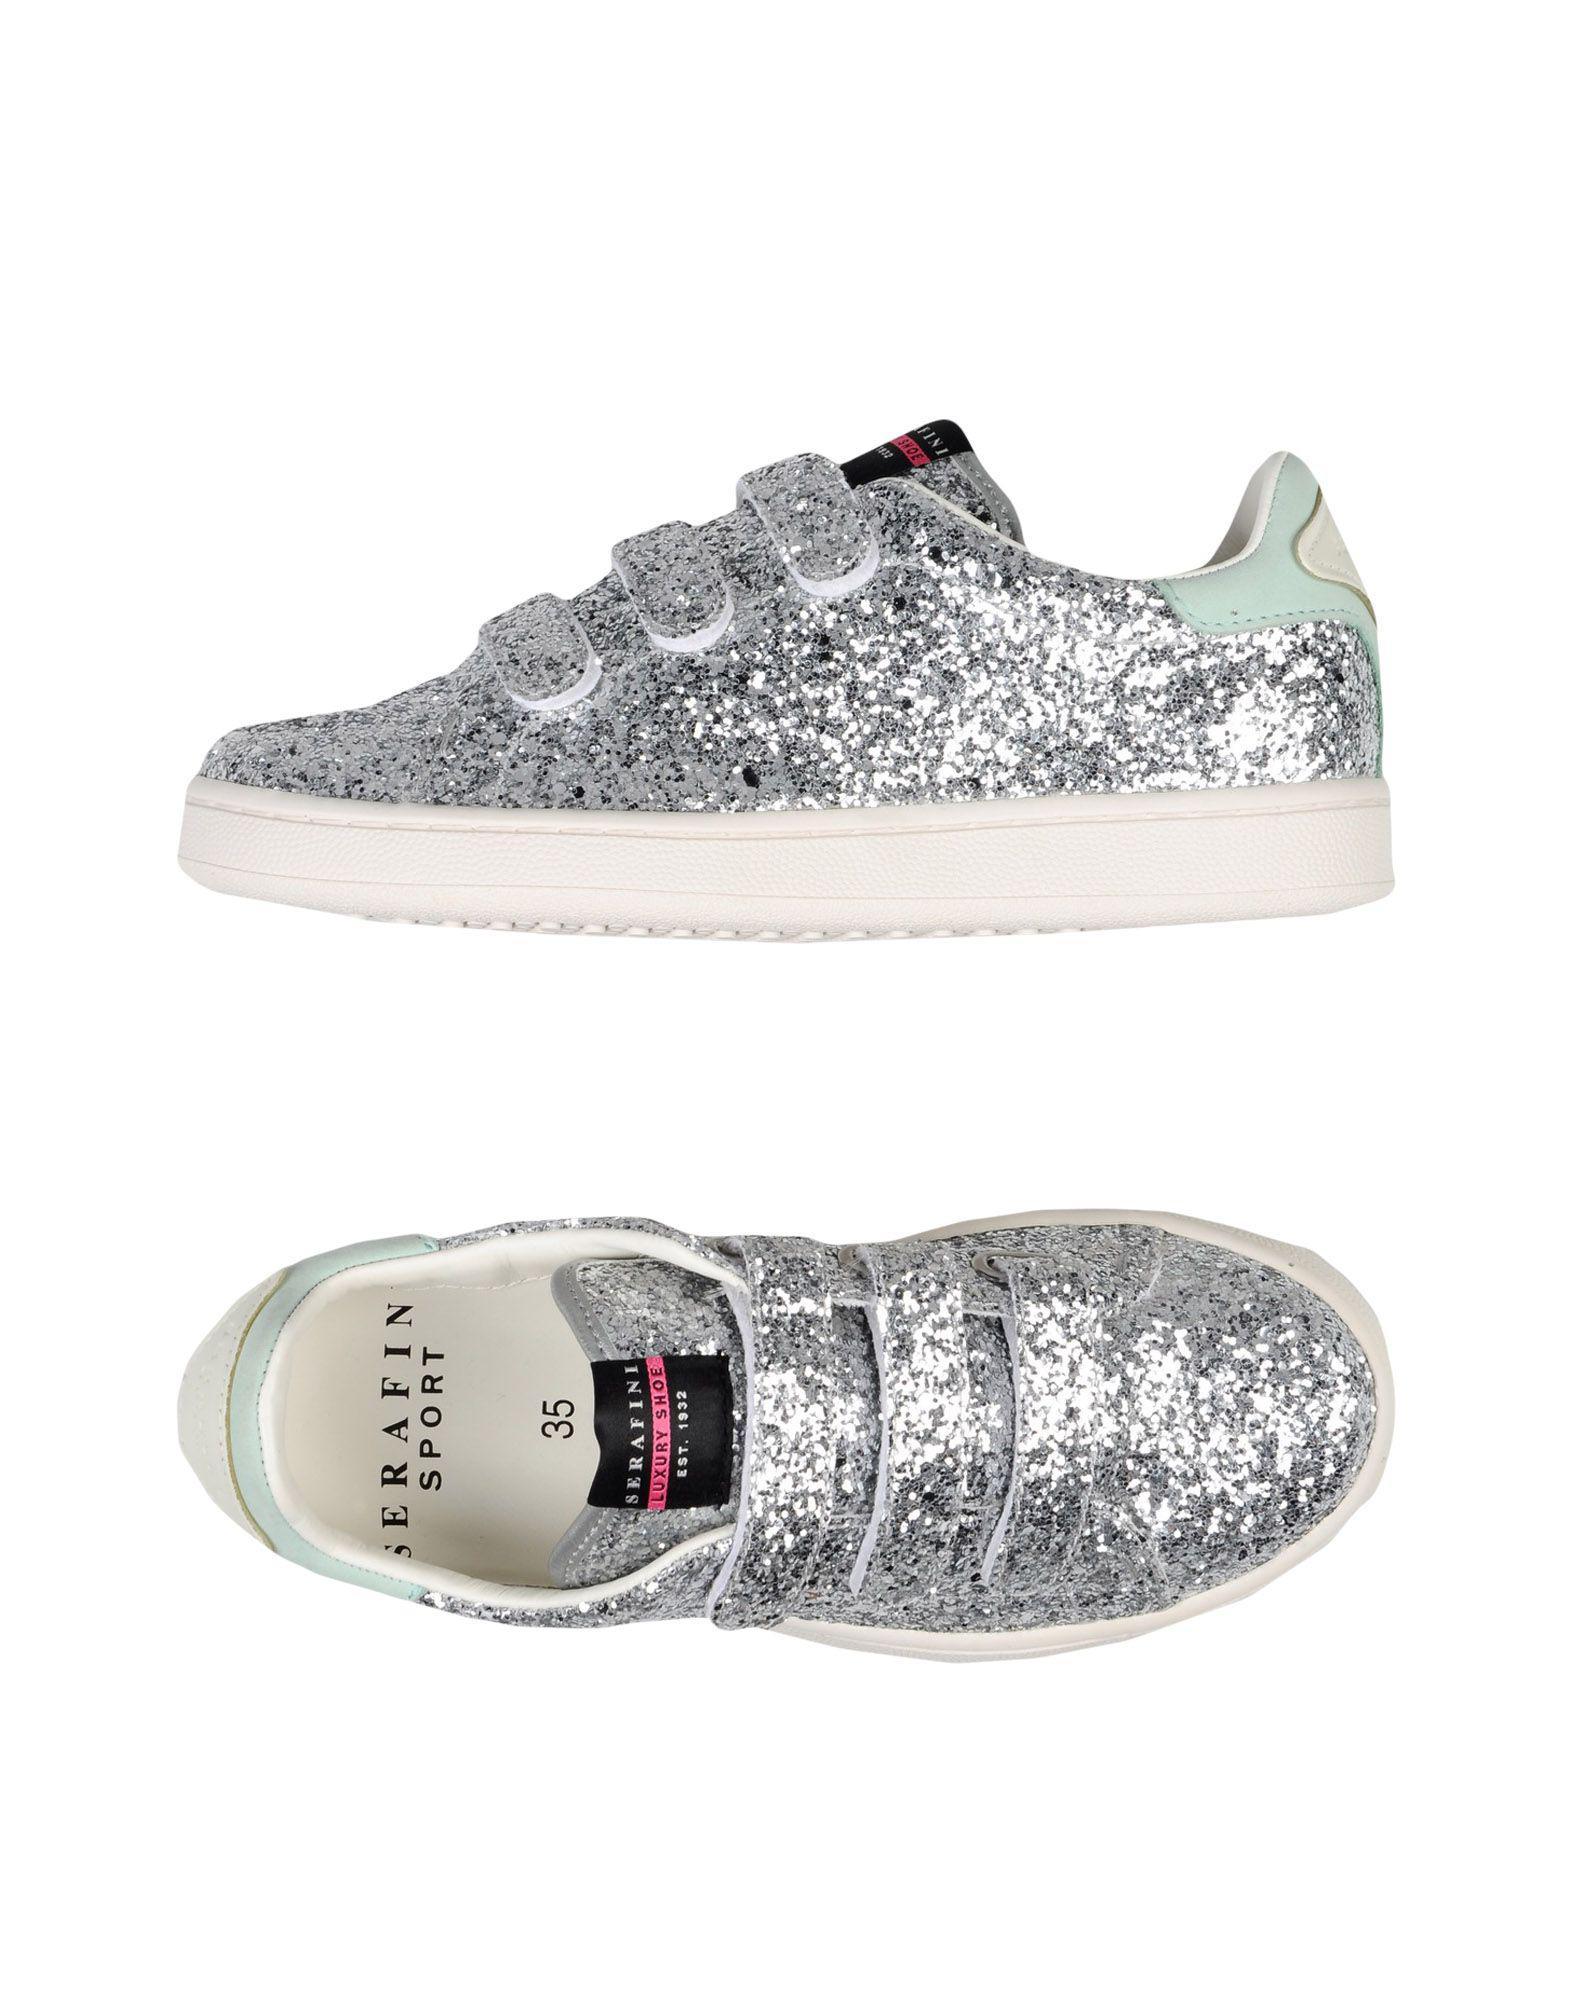 FOOTWEAR - Low-tops & sneakers Serafini 0pLQxEL